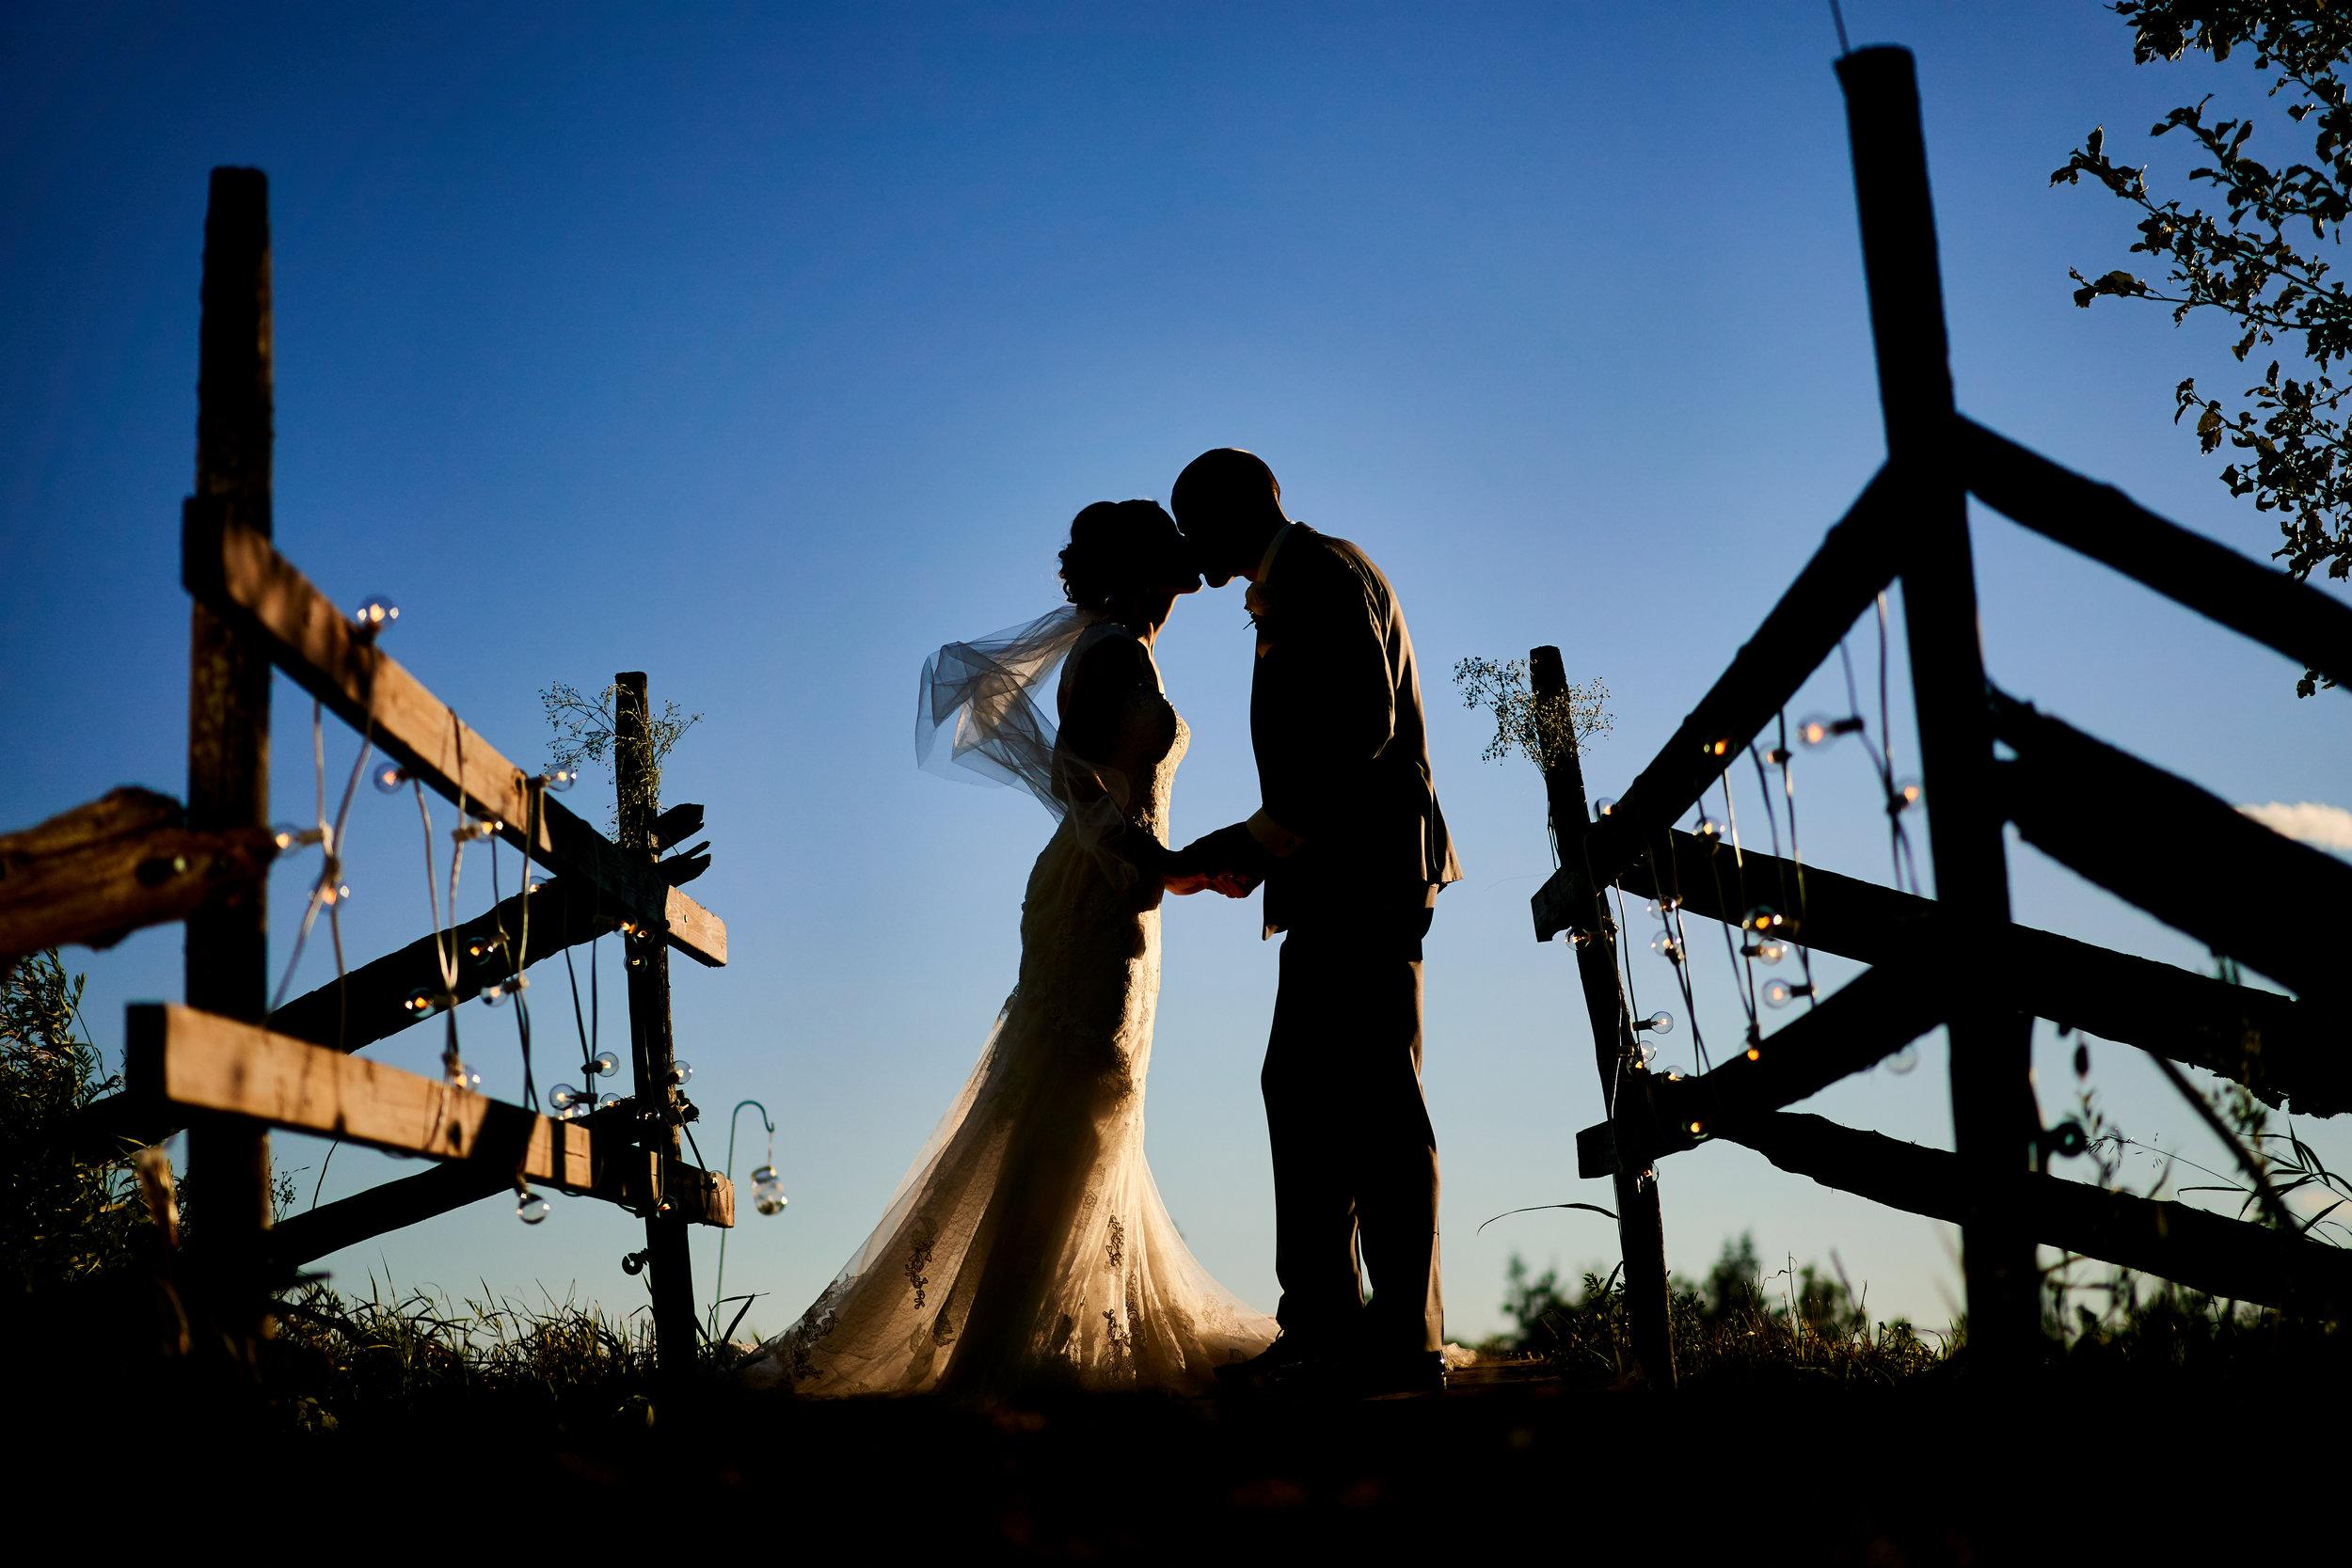 Fast forward to Baukje & Marc's wedding